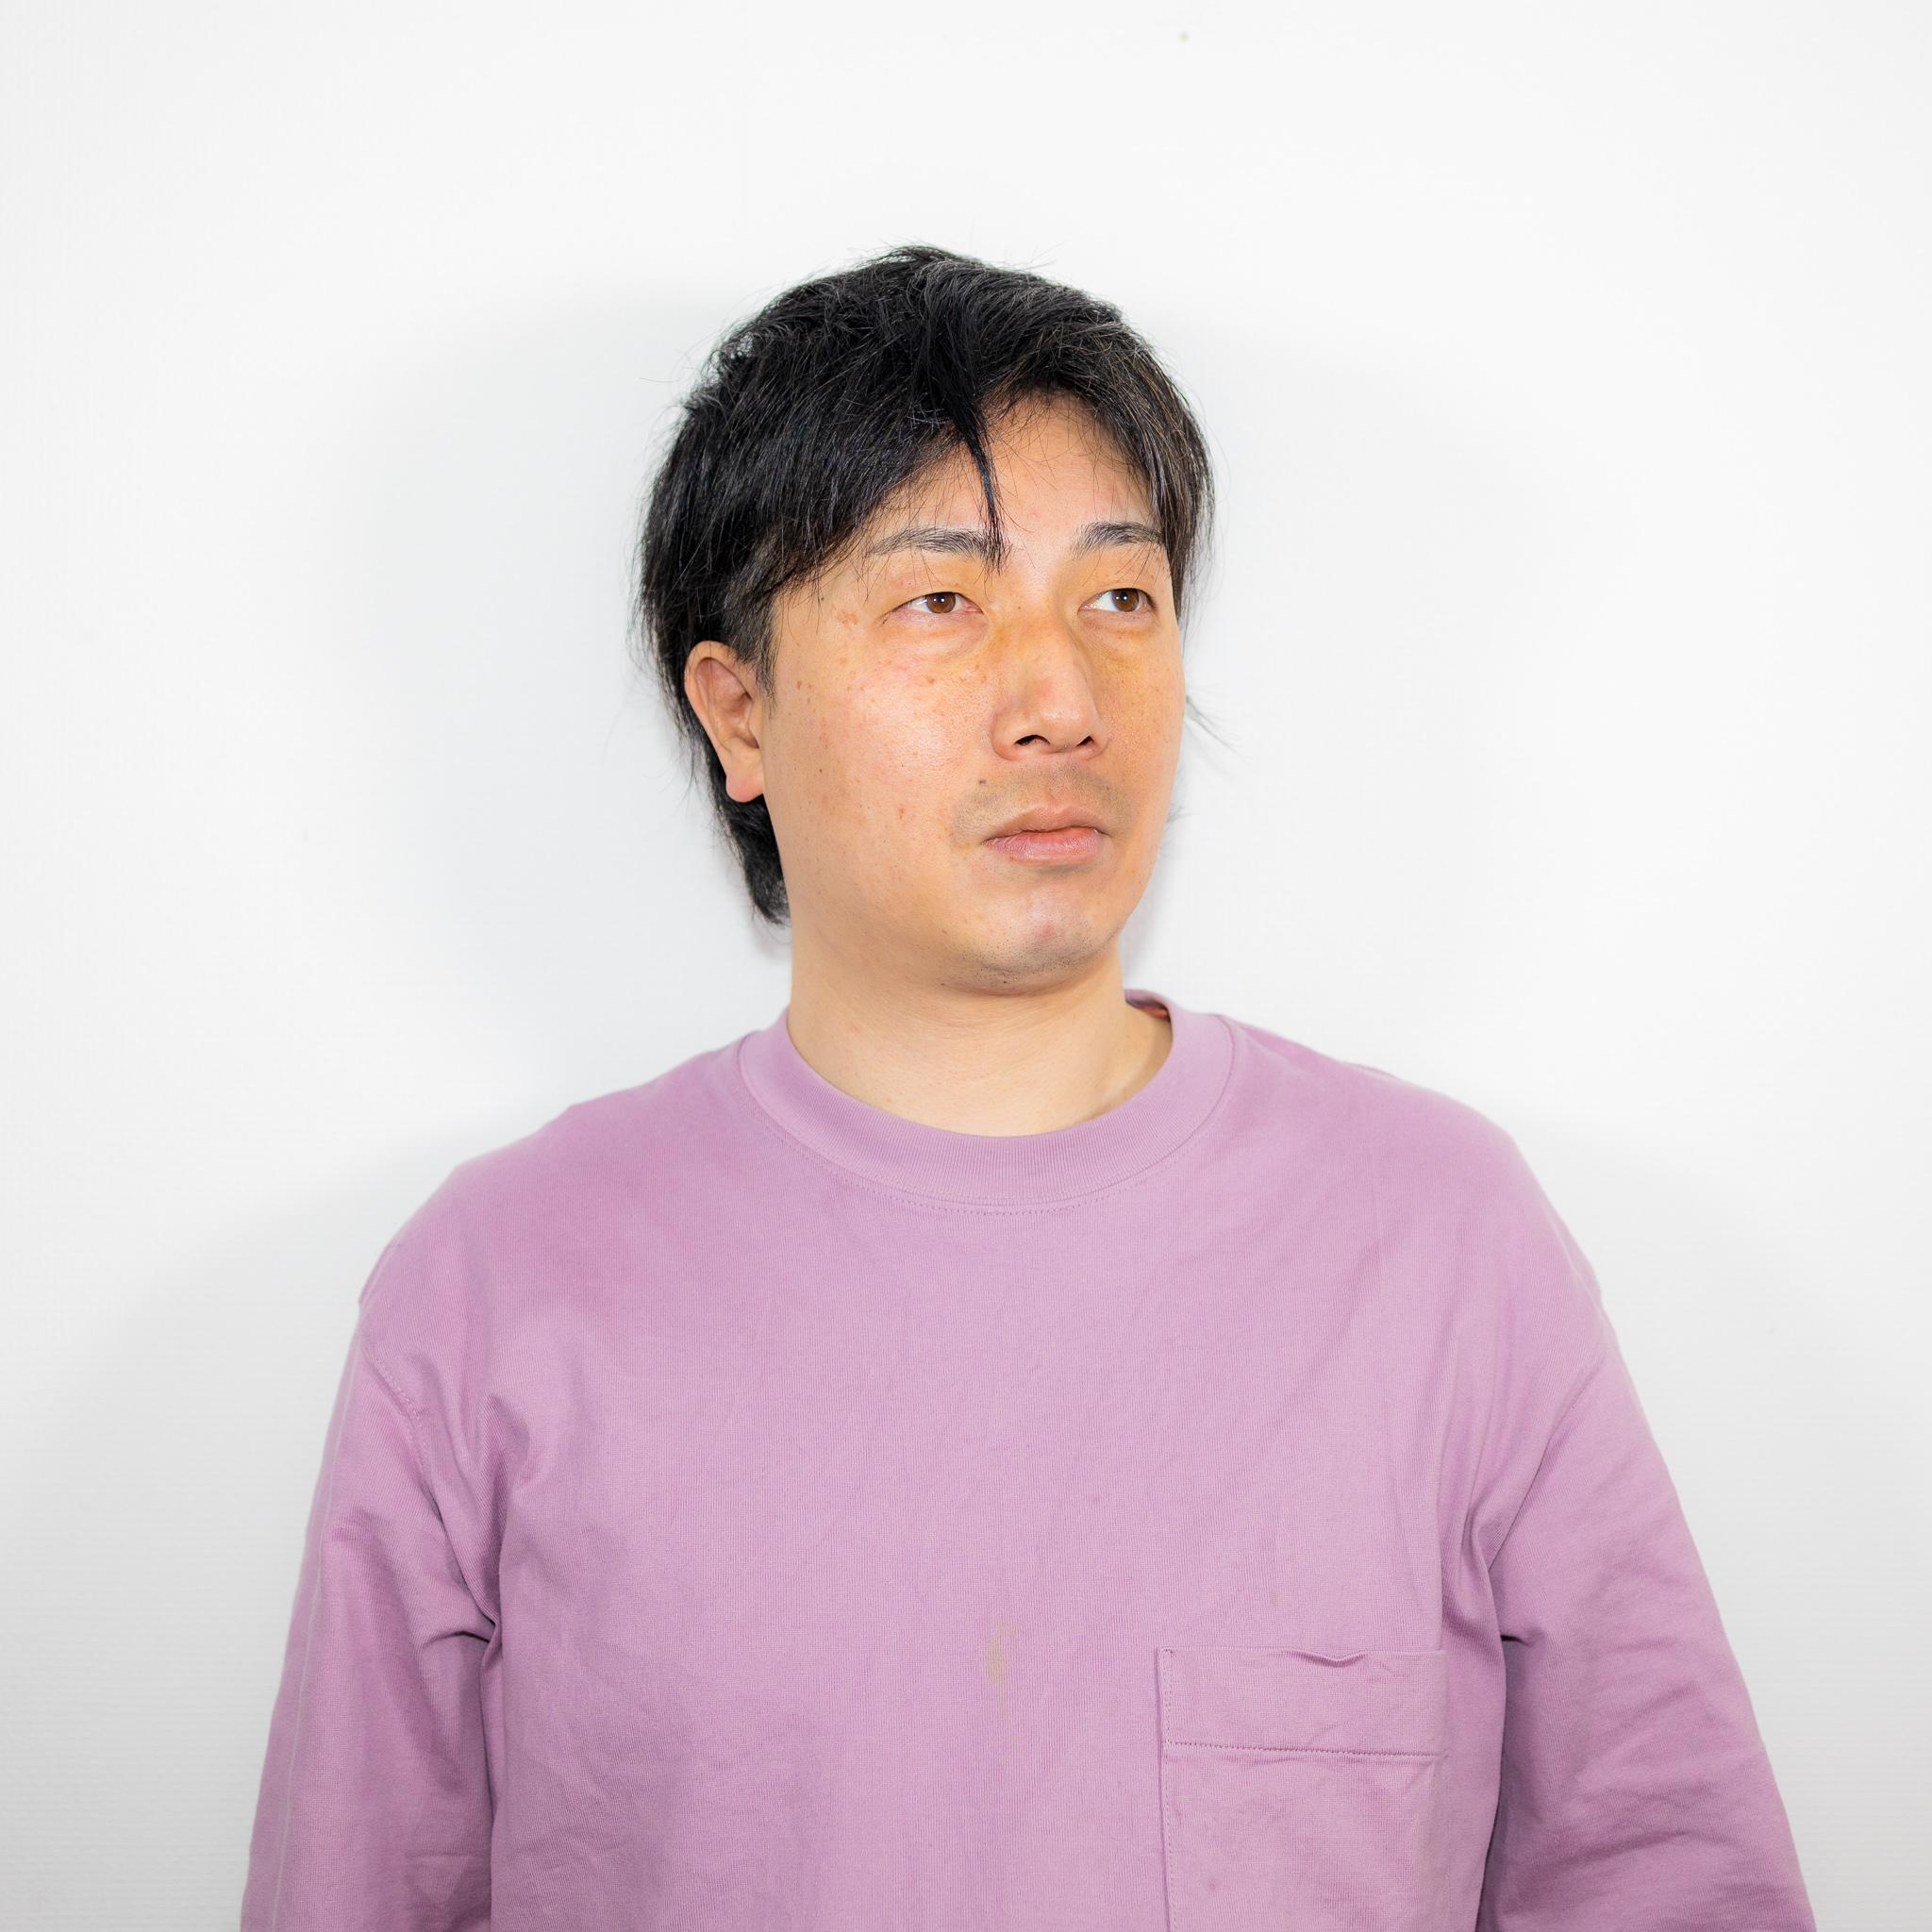 KAZUMASA YONAIYAMA